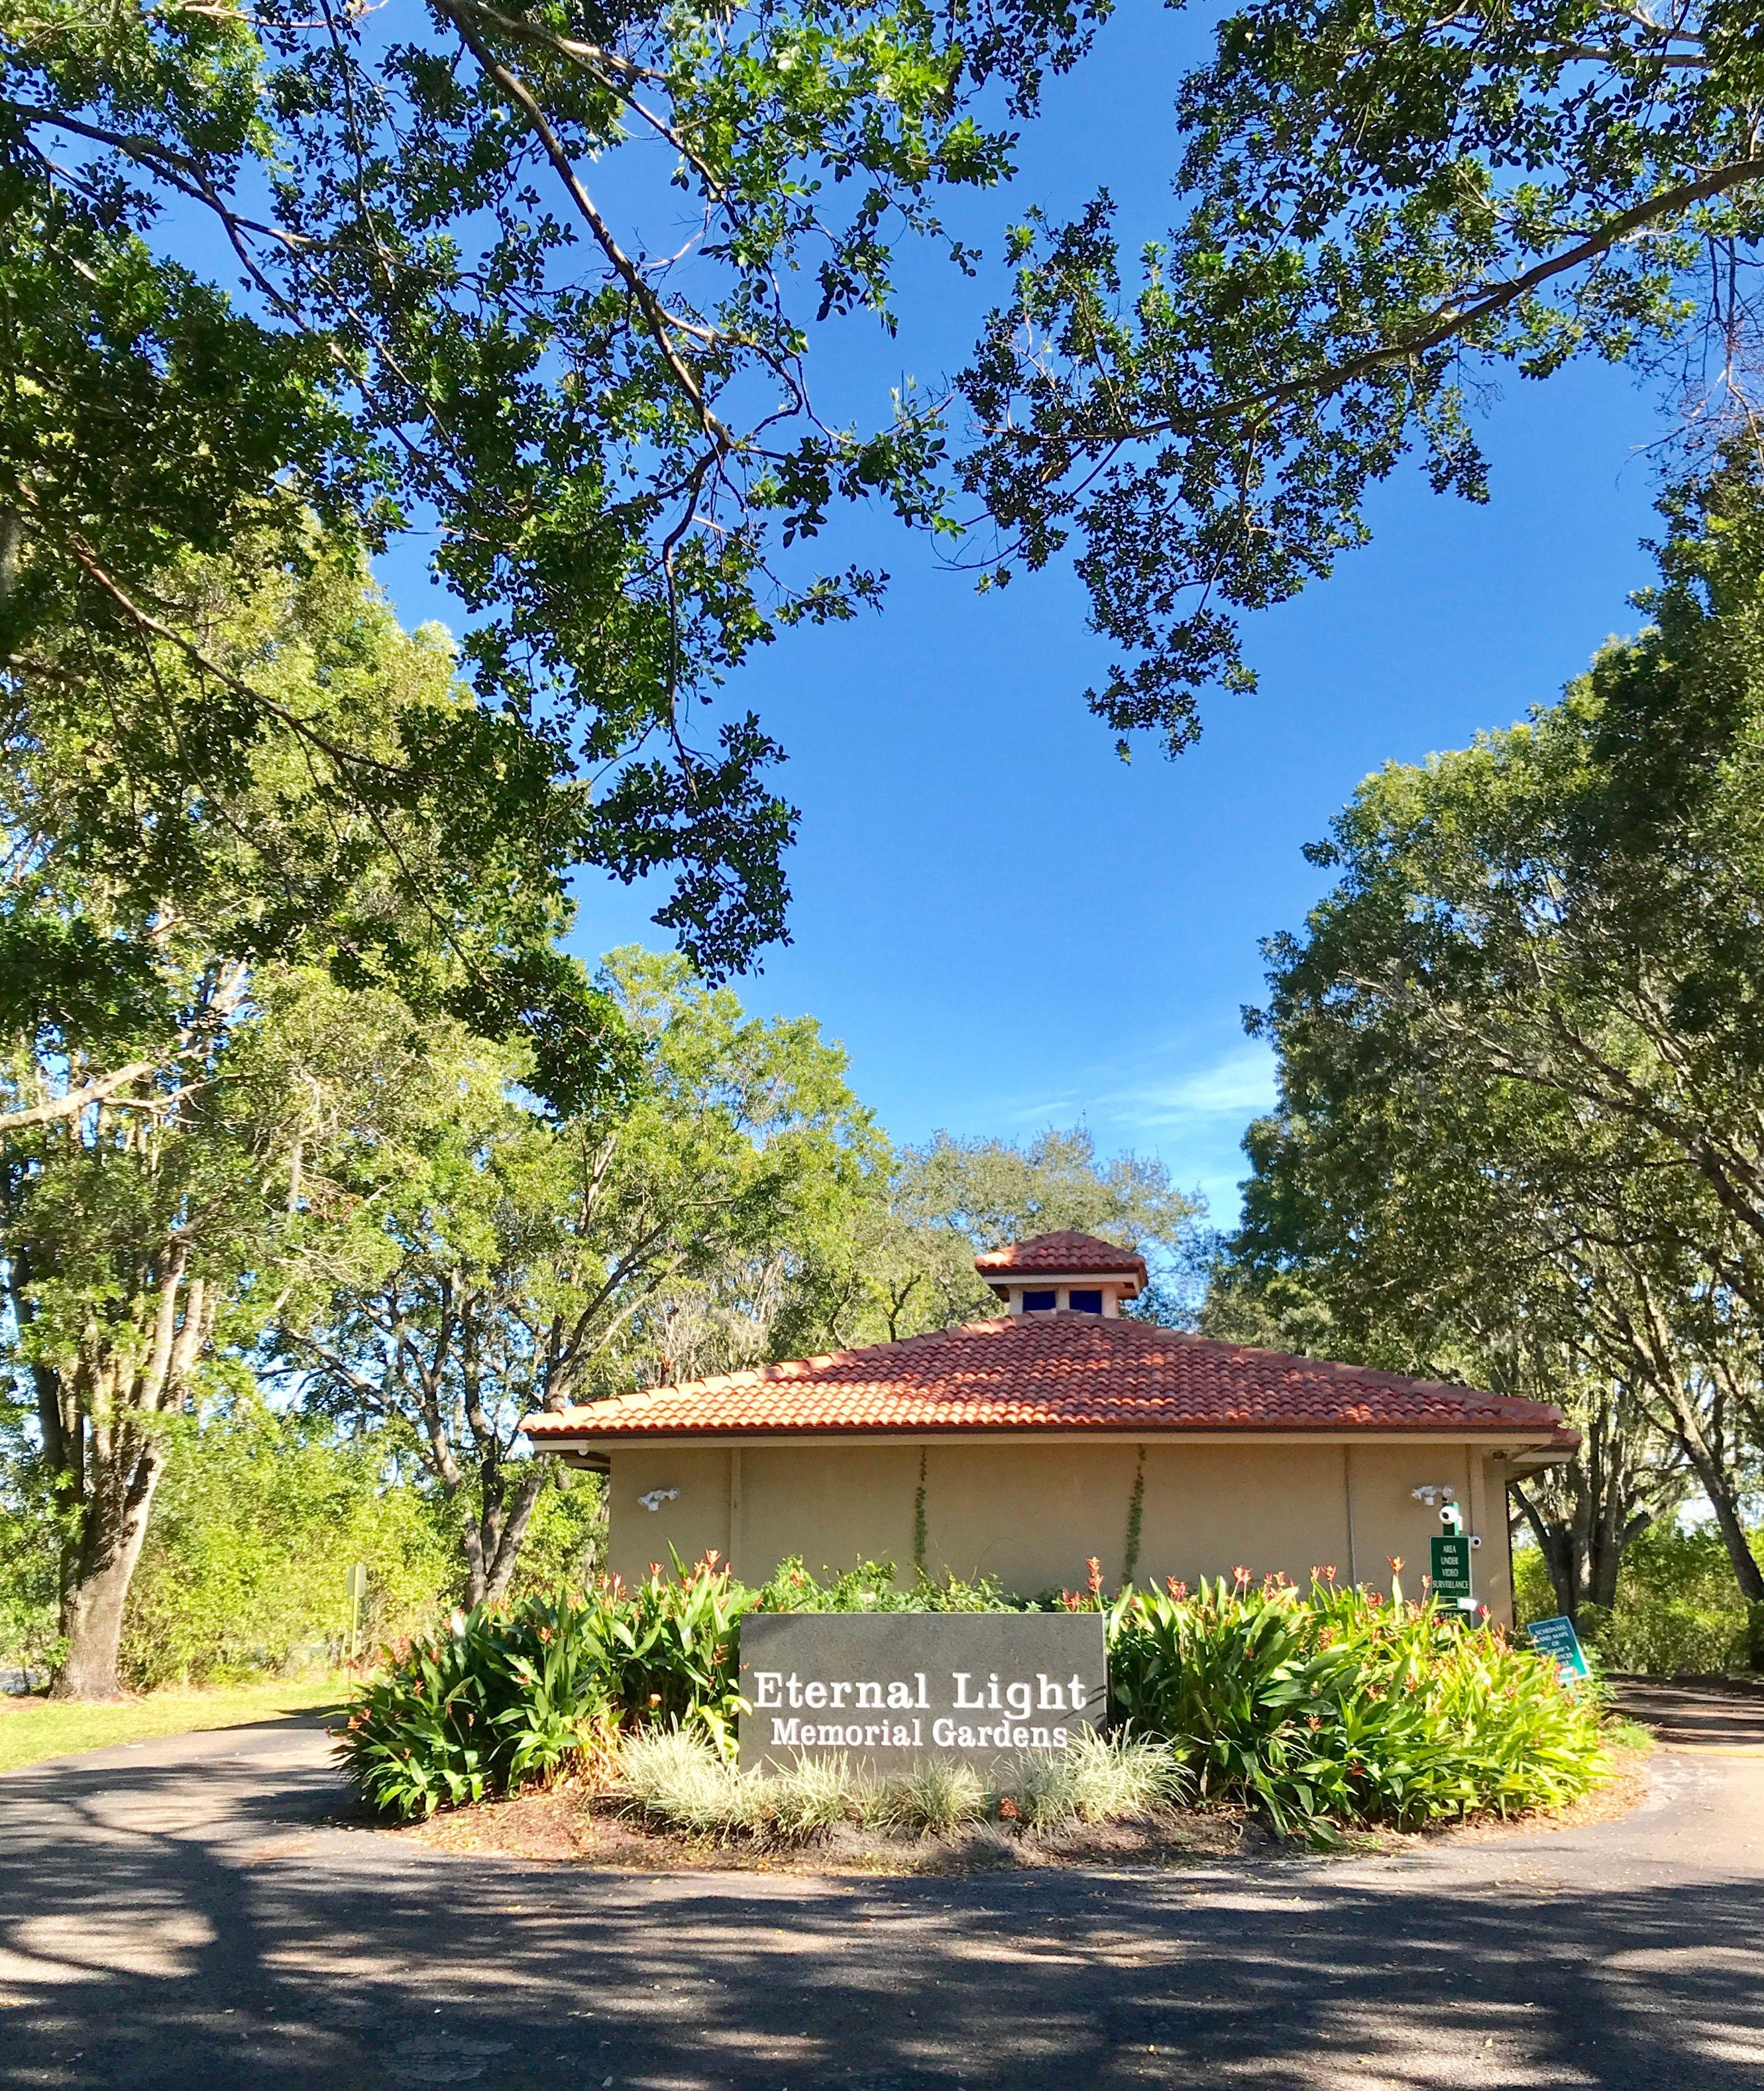 Eternal Light Memorial Gardens Boynton Beach Fl